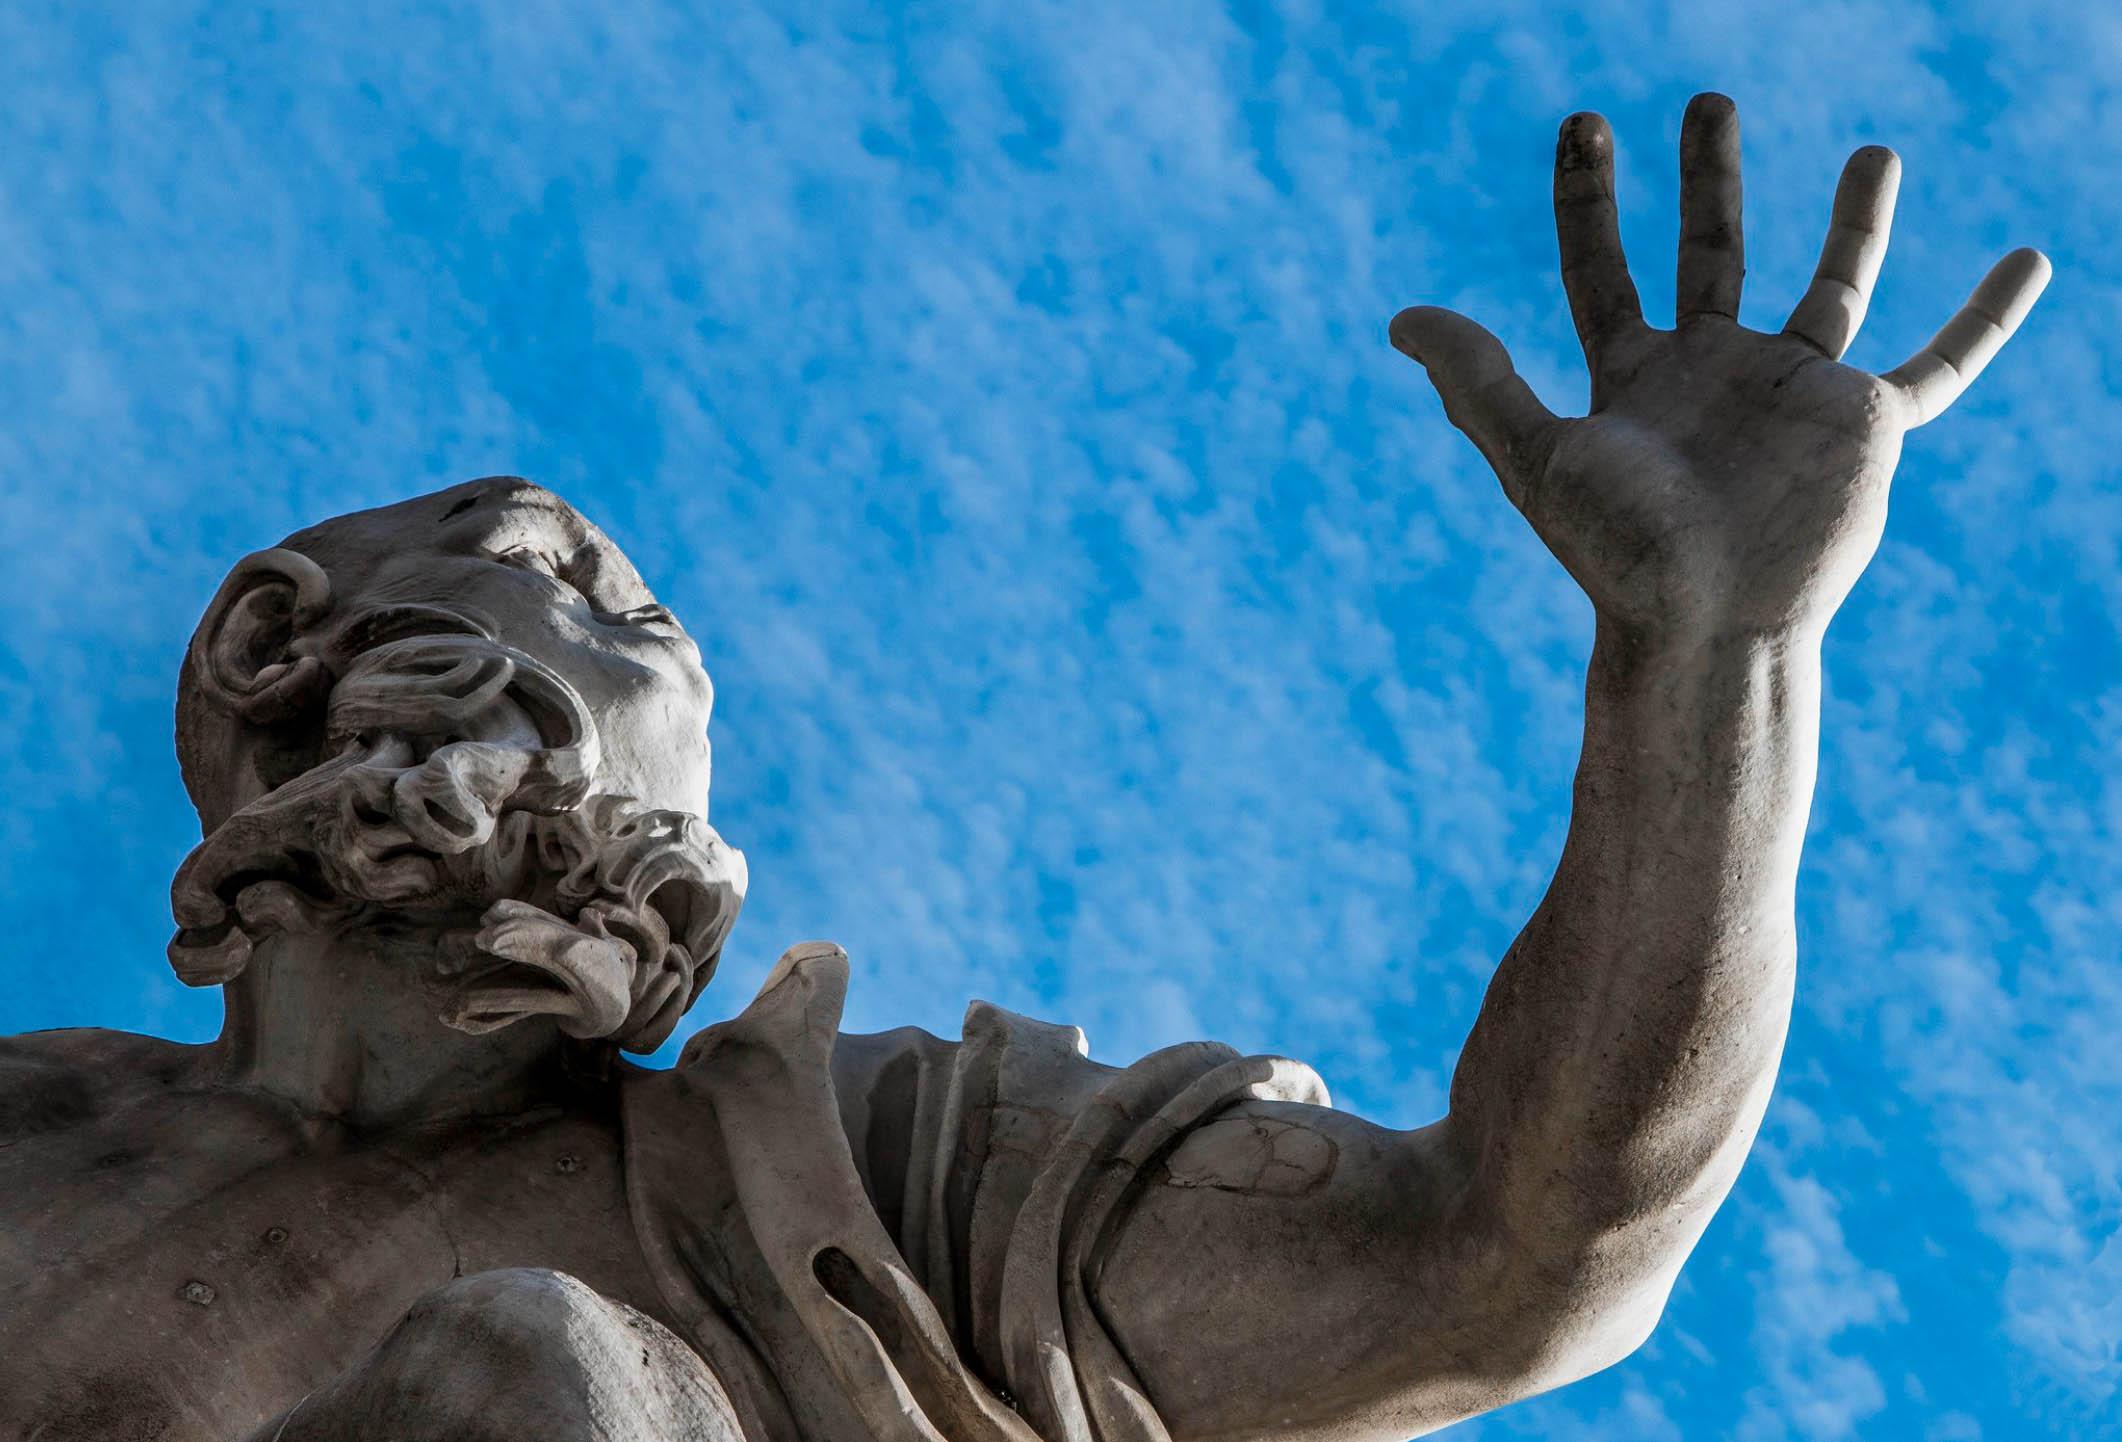 http://www.rusrim.com/wp-content/uploads/2021/07/Пяцца-Навона-Фонтан-Бернини-пред-Базилика-Сант-Аньезе-ин-Агоне.jpg